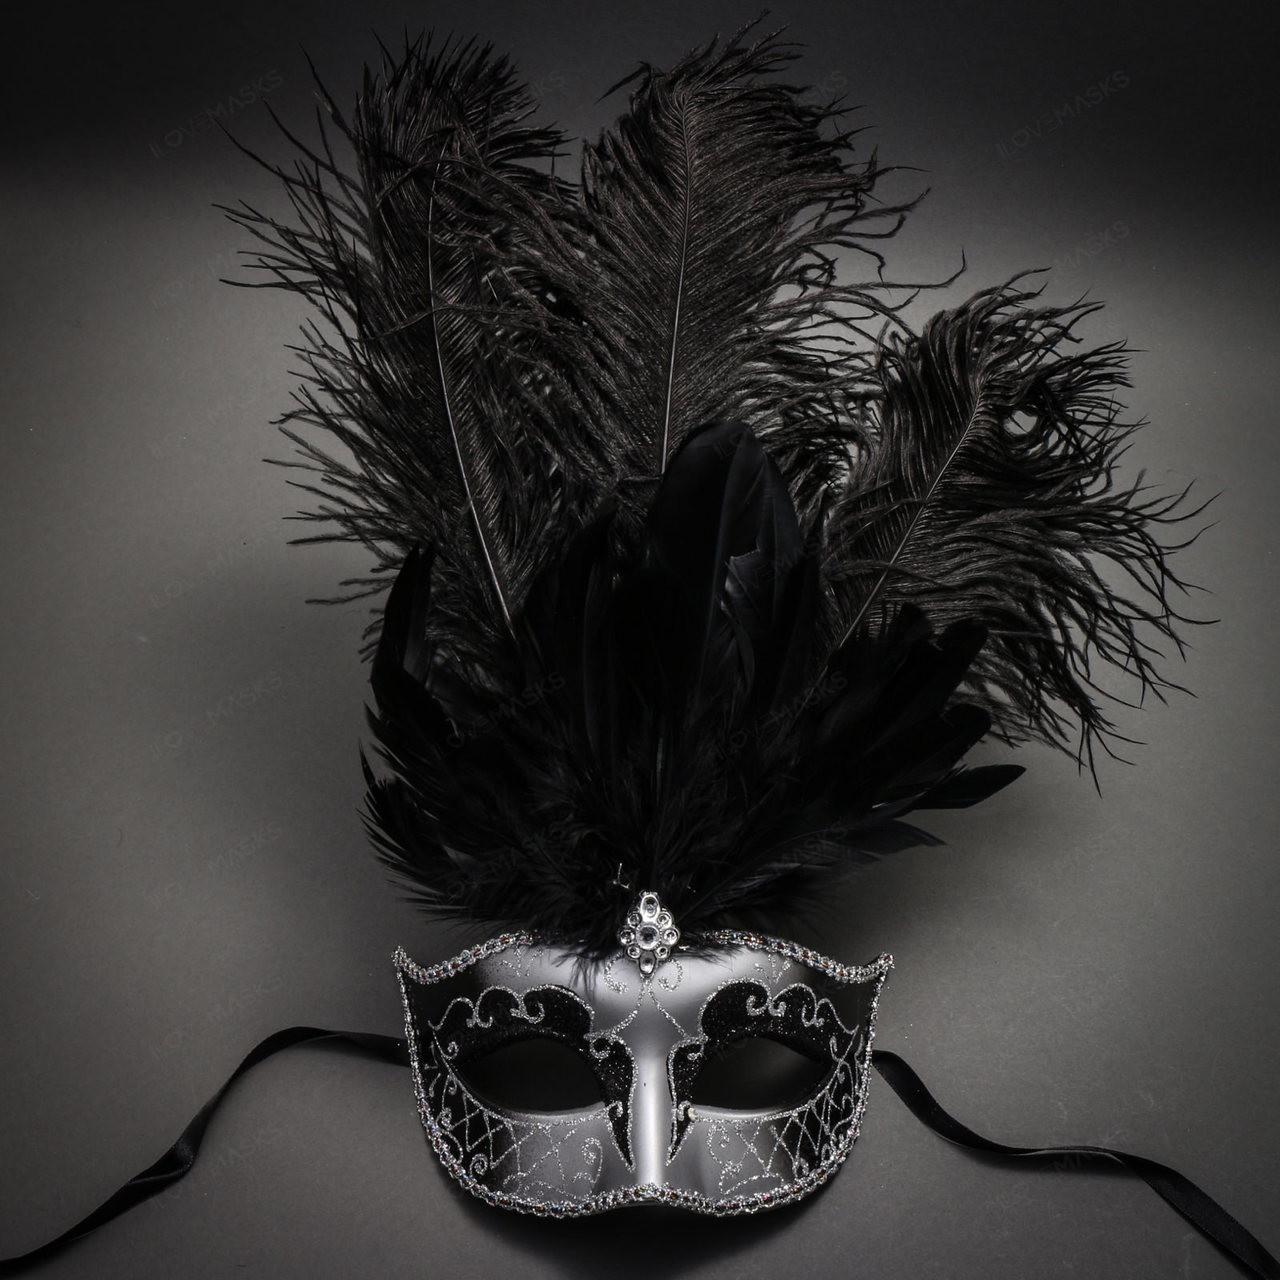 Purple Silver Masquerade Mask Wedding Masquerade Mask Party Event Mask Feather Masquerade Mask Mask for Women Luxury Women Mask